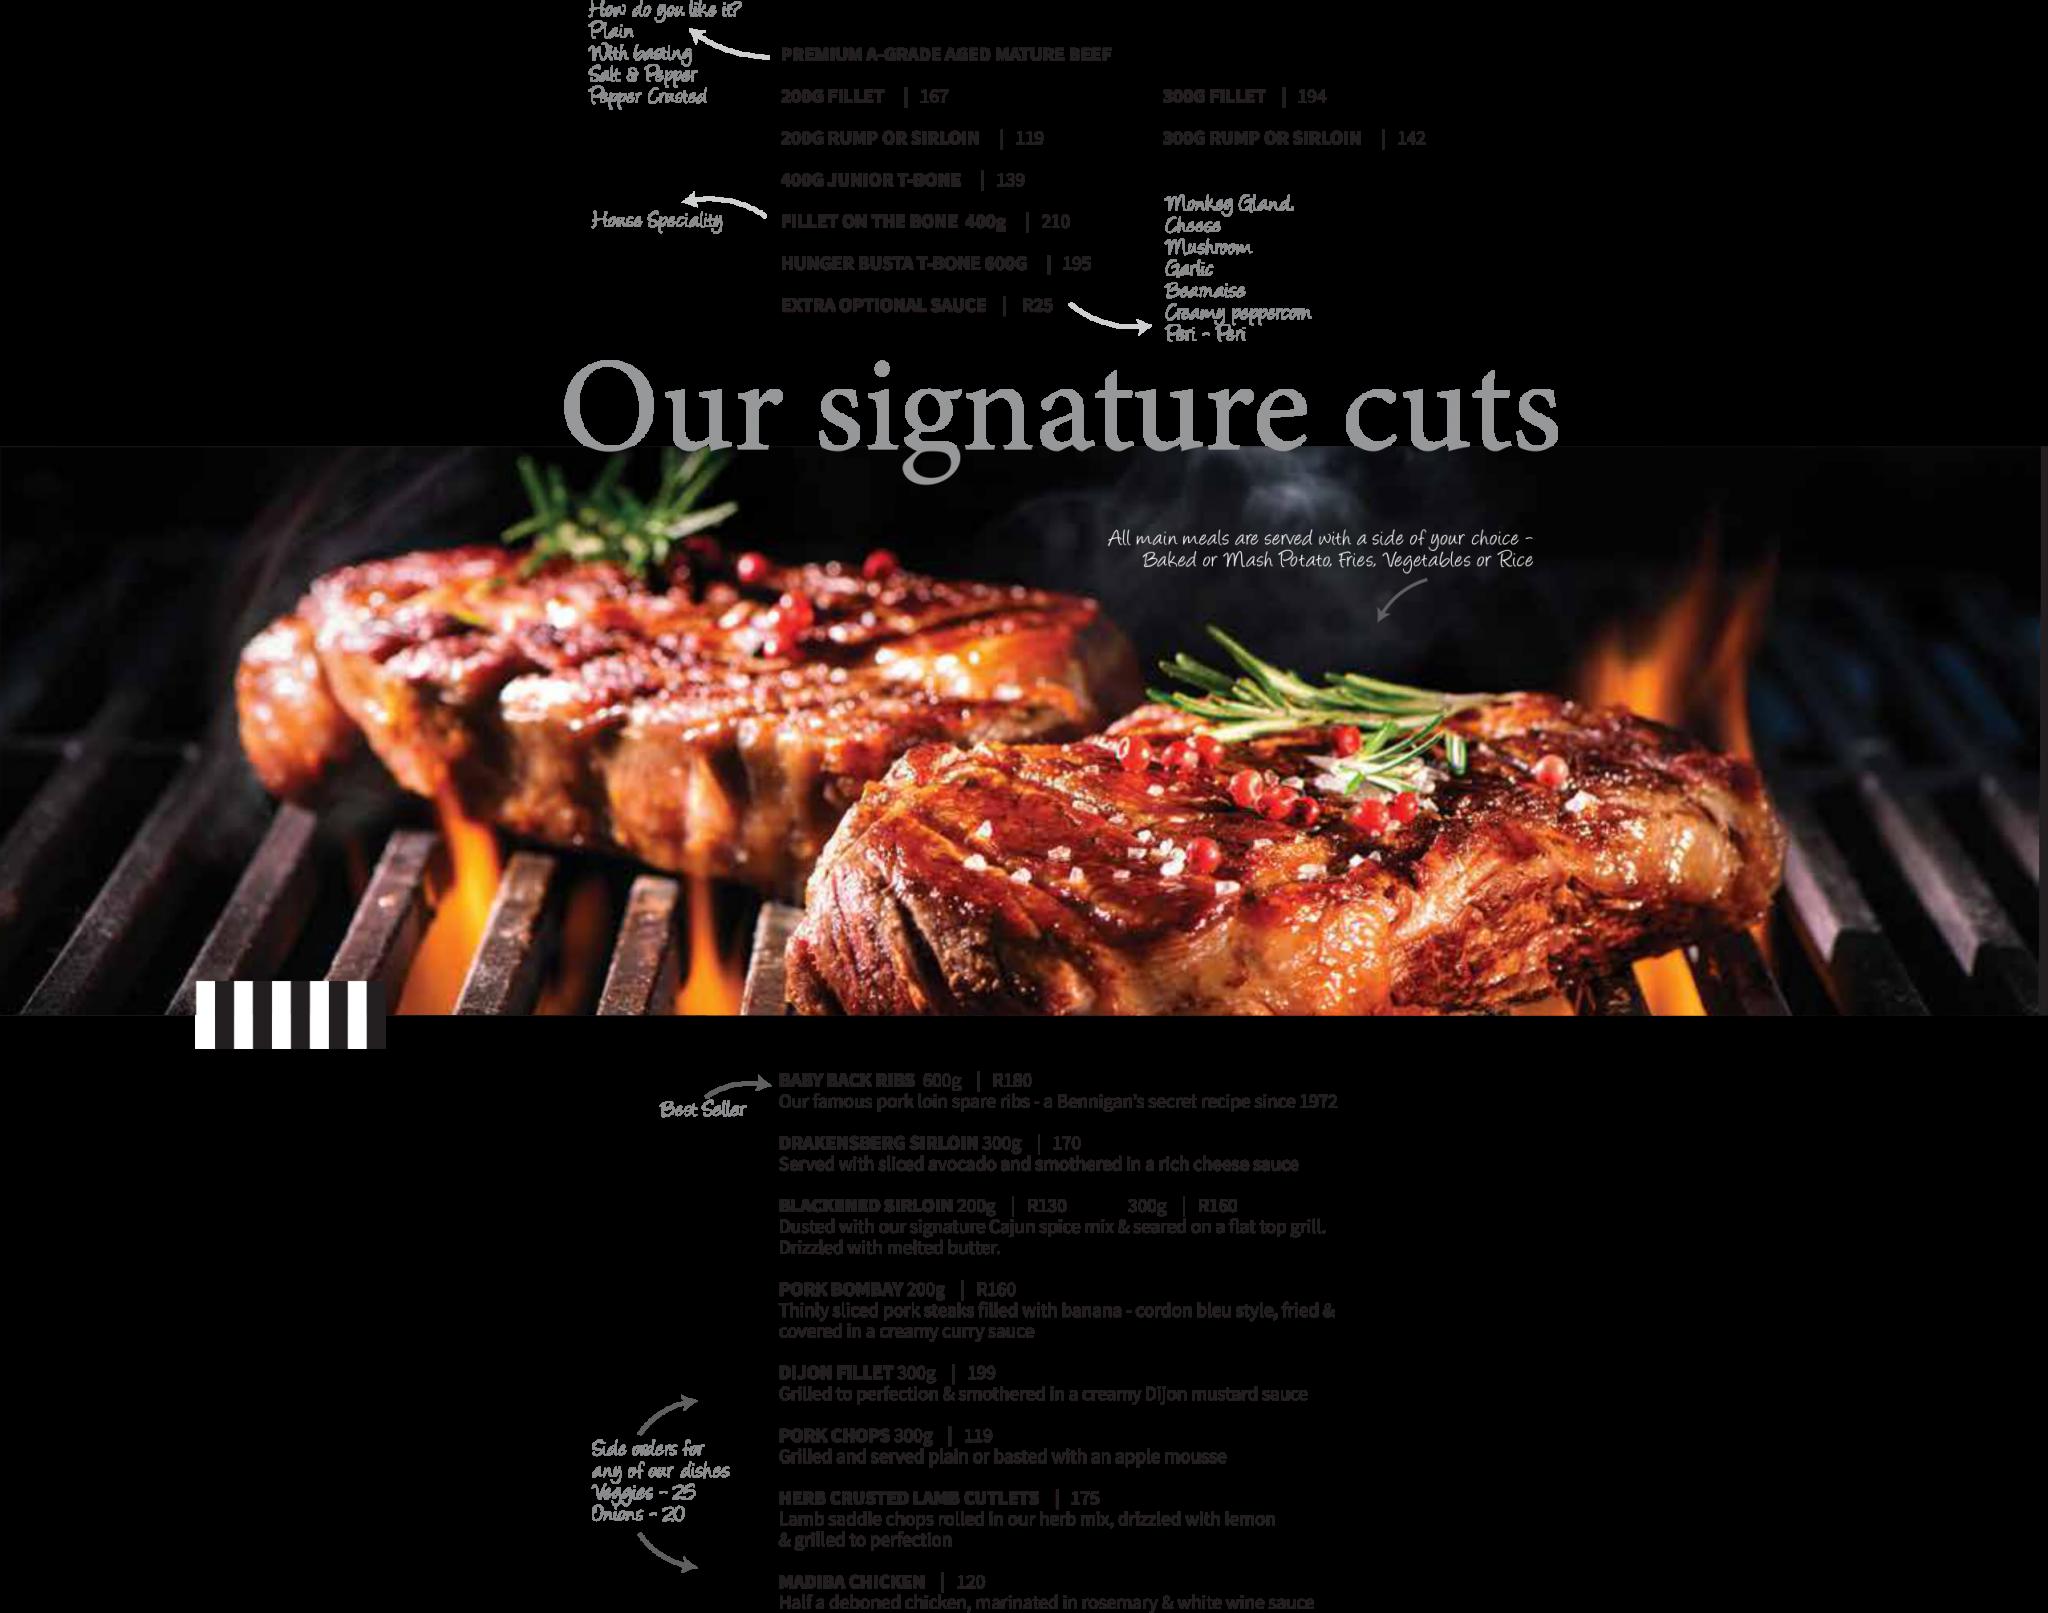 signature_cuts_menu_slidea